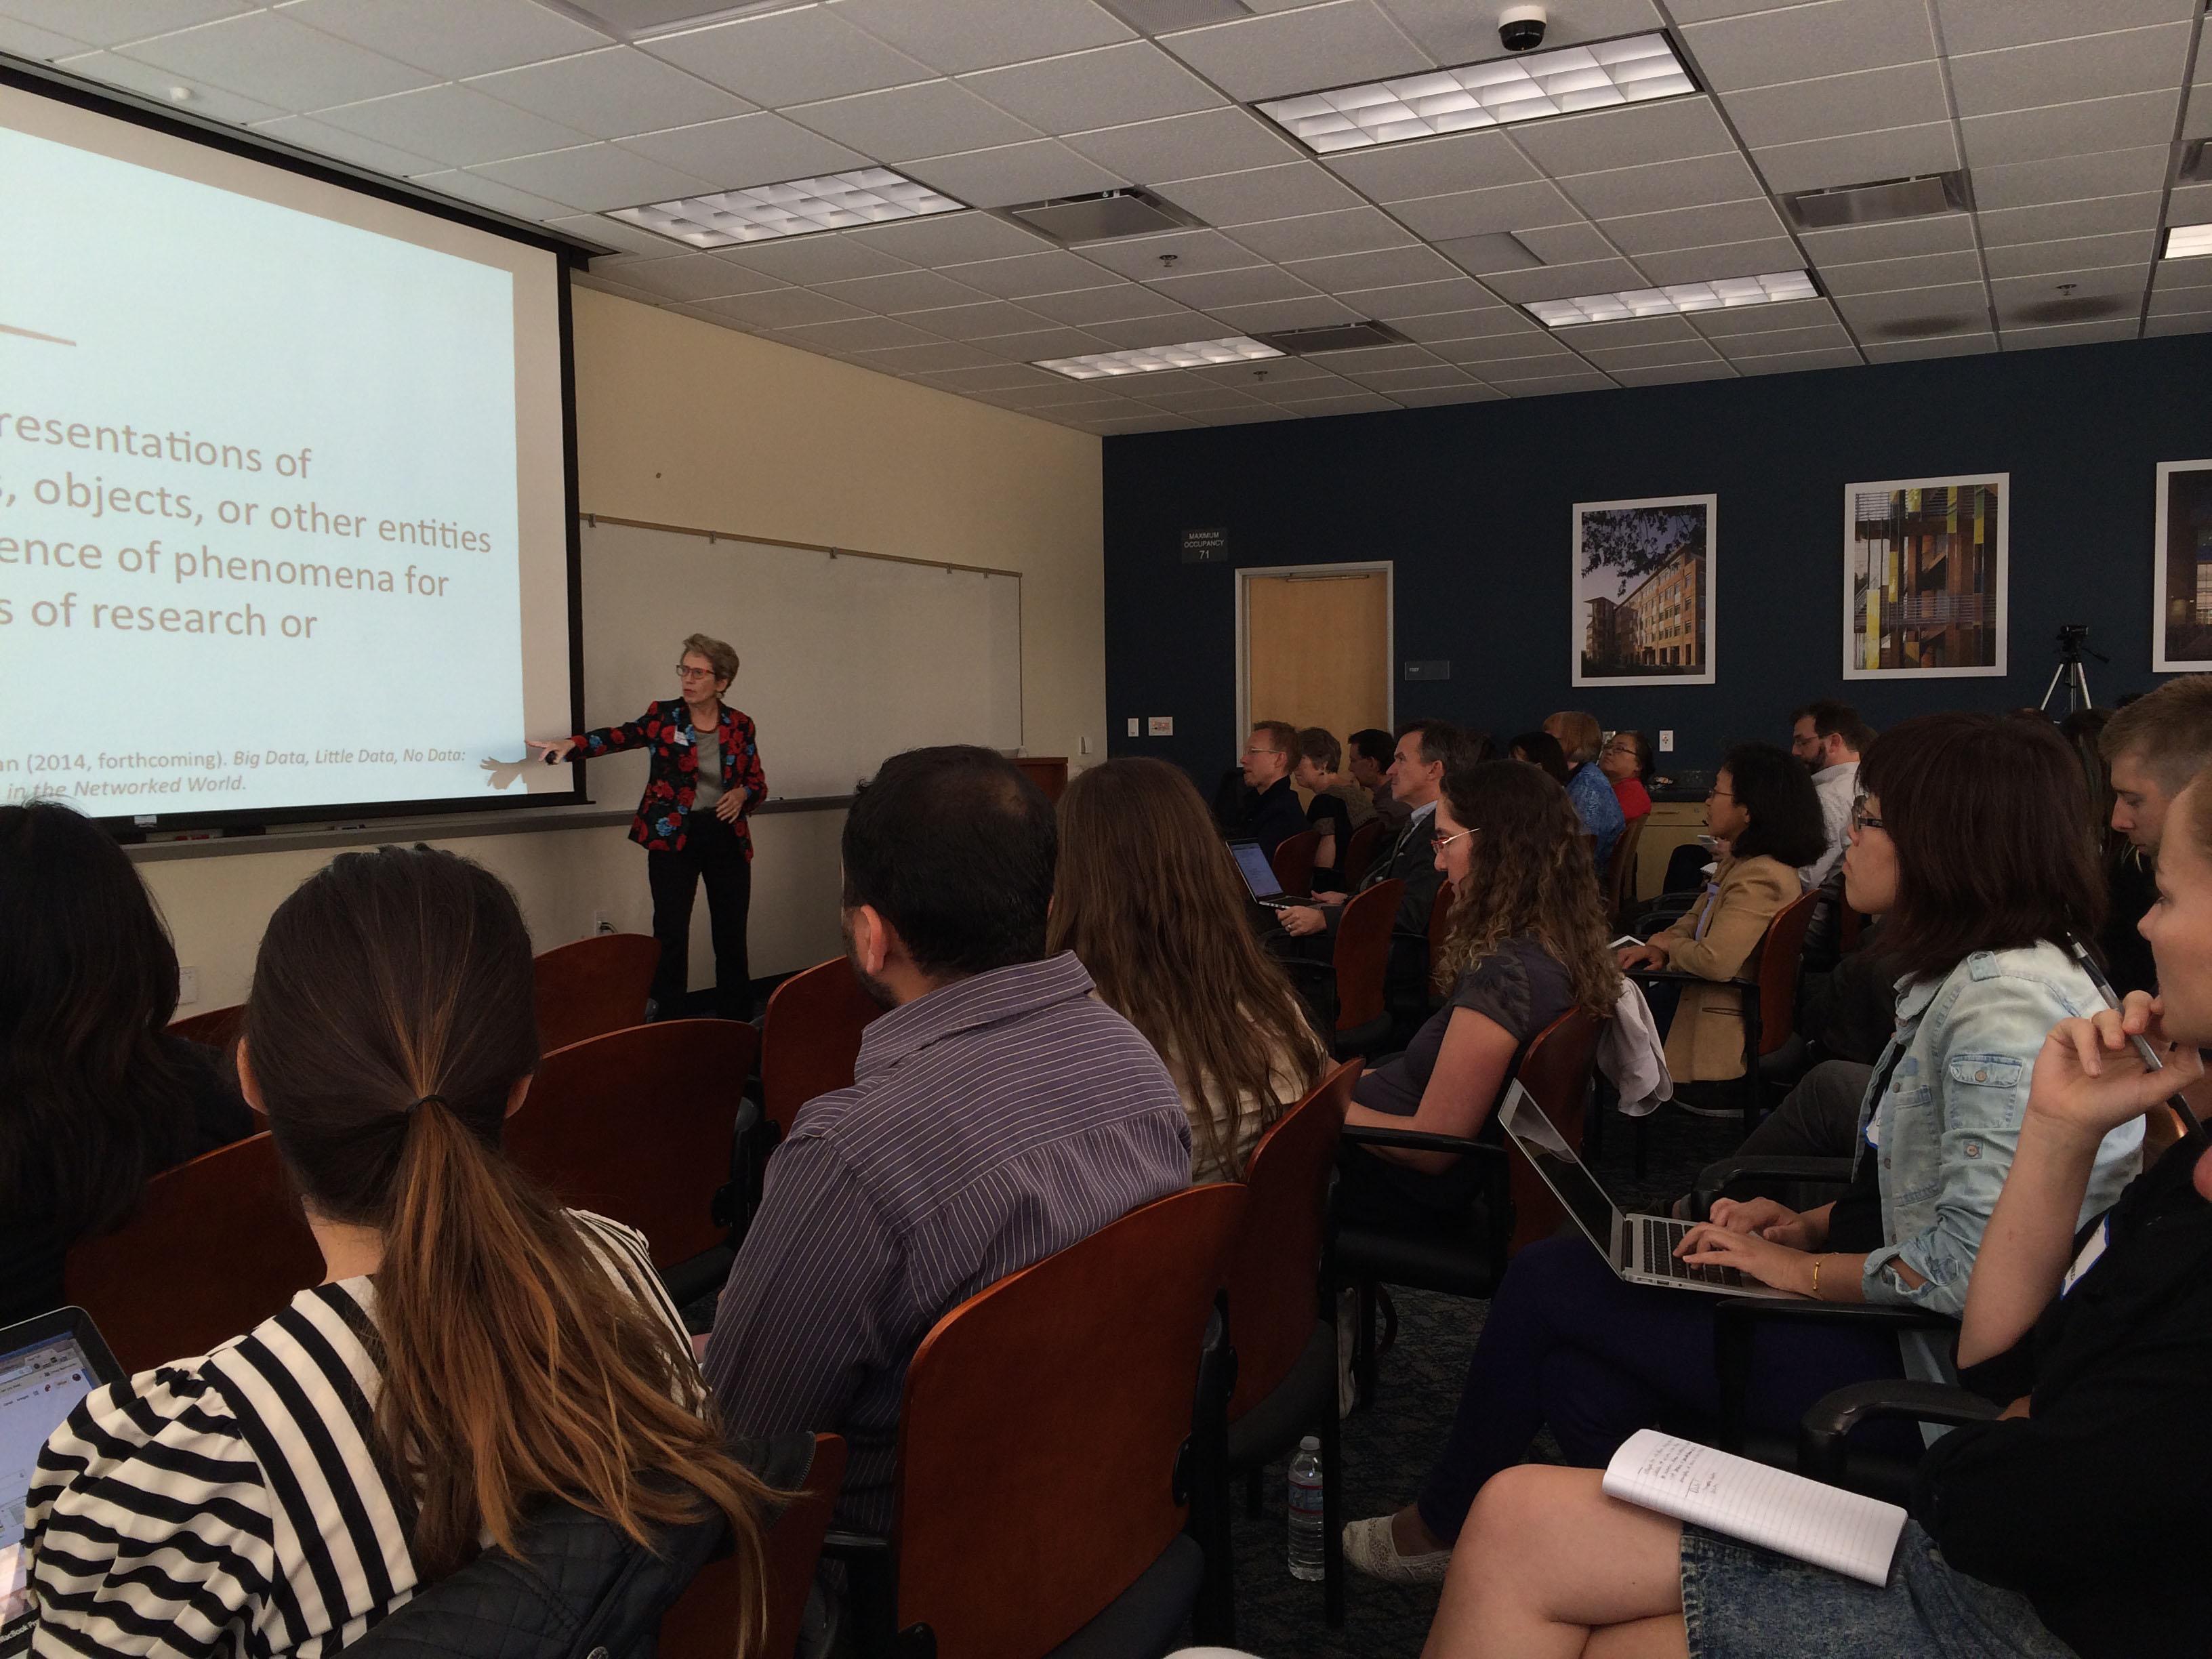 Borgman presents on the Data Dance in Irvine, April 2014.